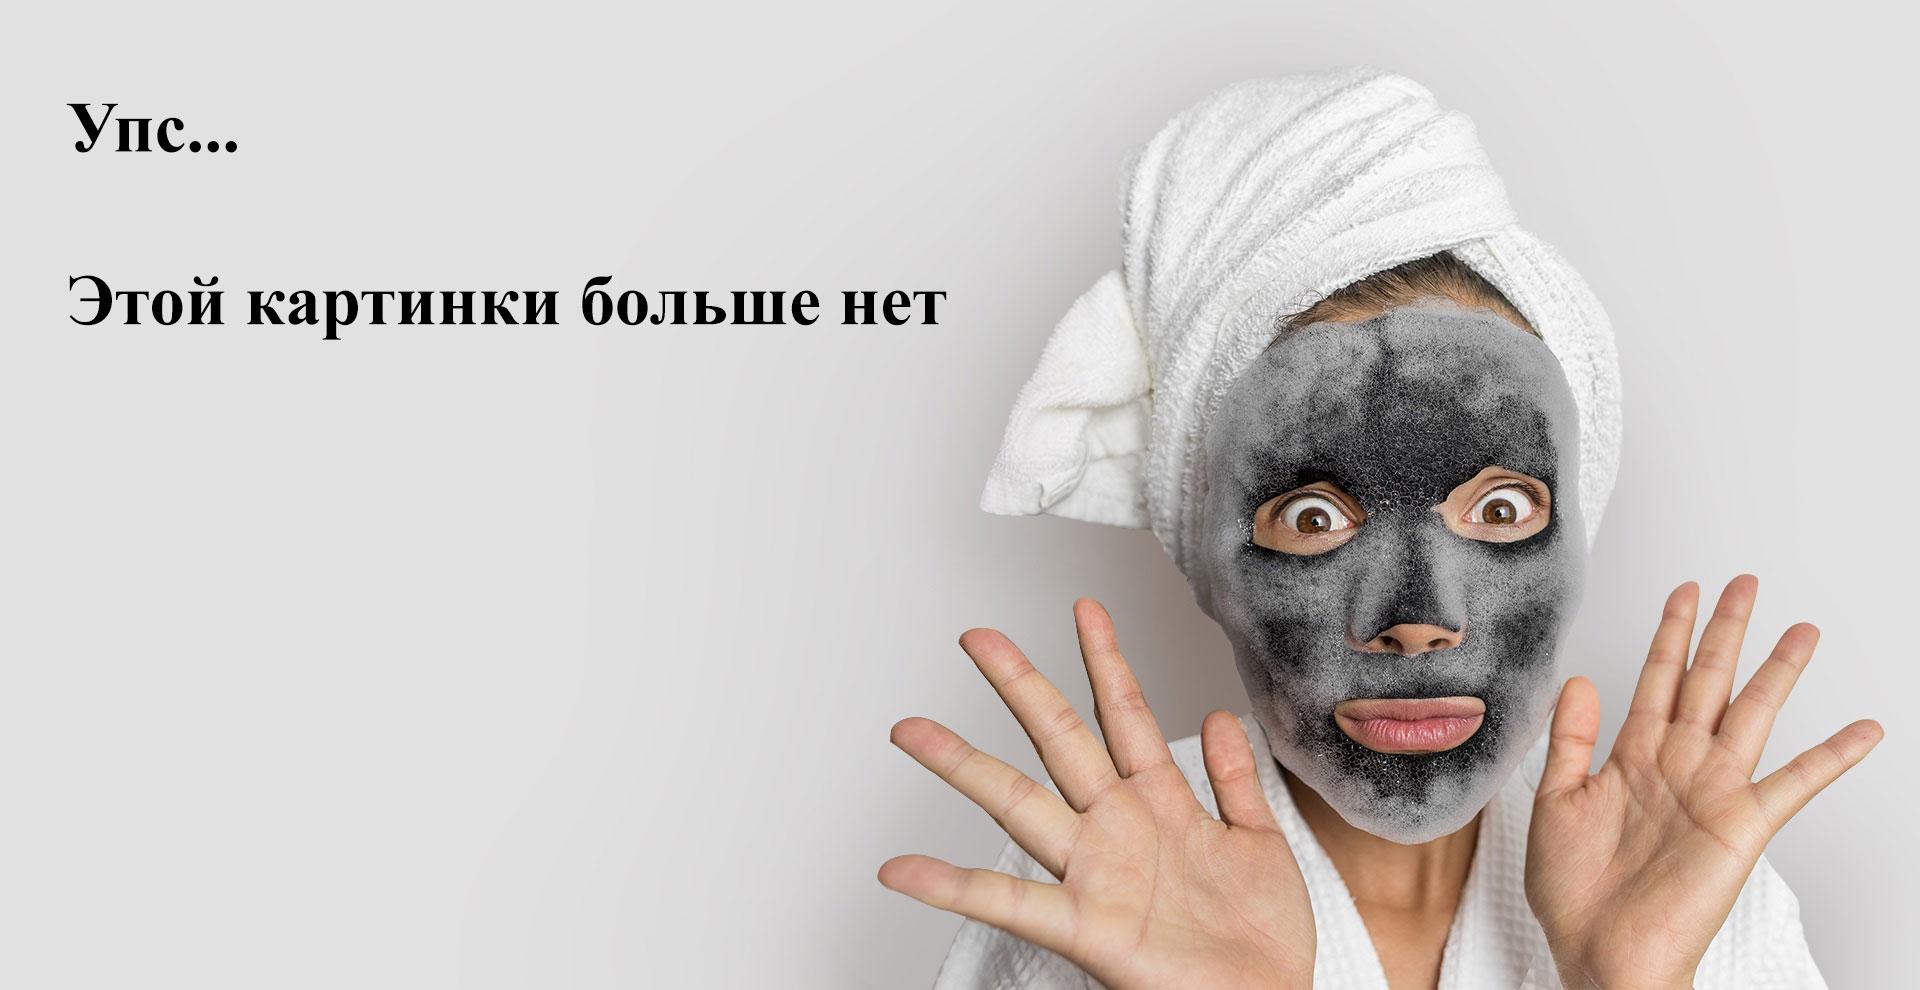 Gemene, Фруктовые кислоты для лица, 20 мл